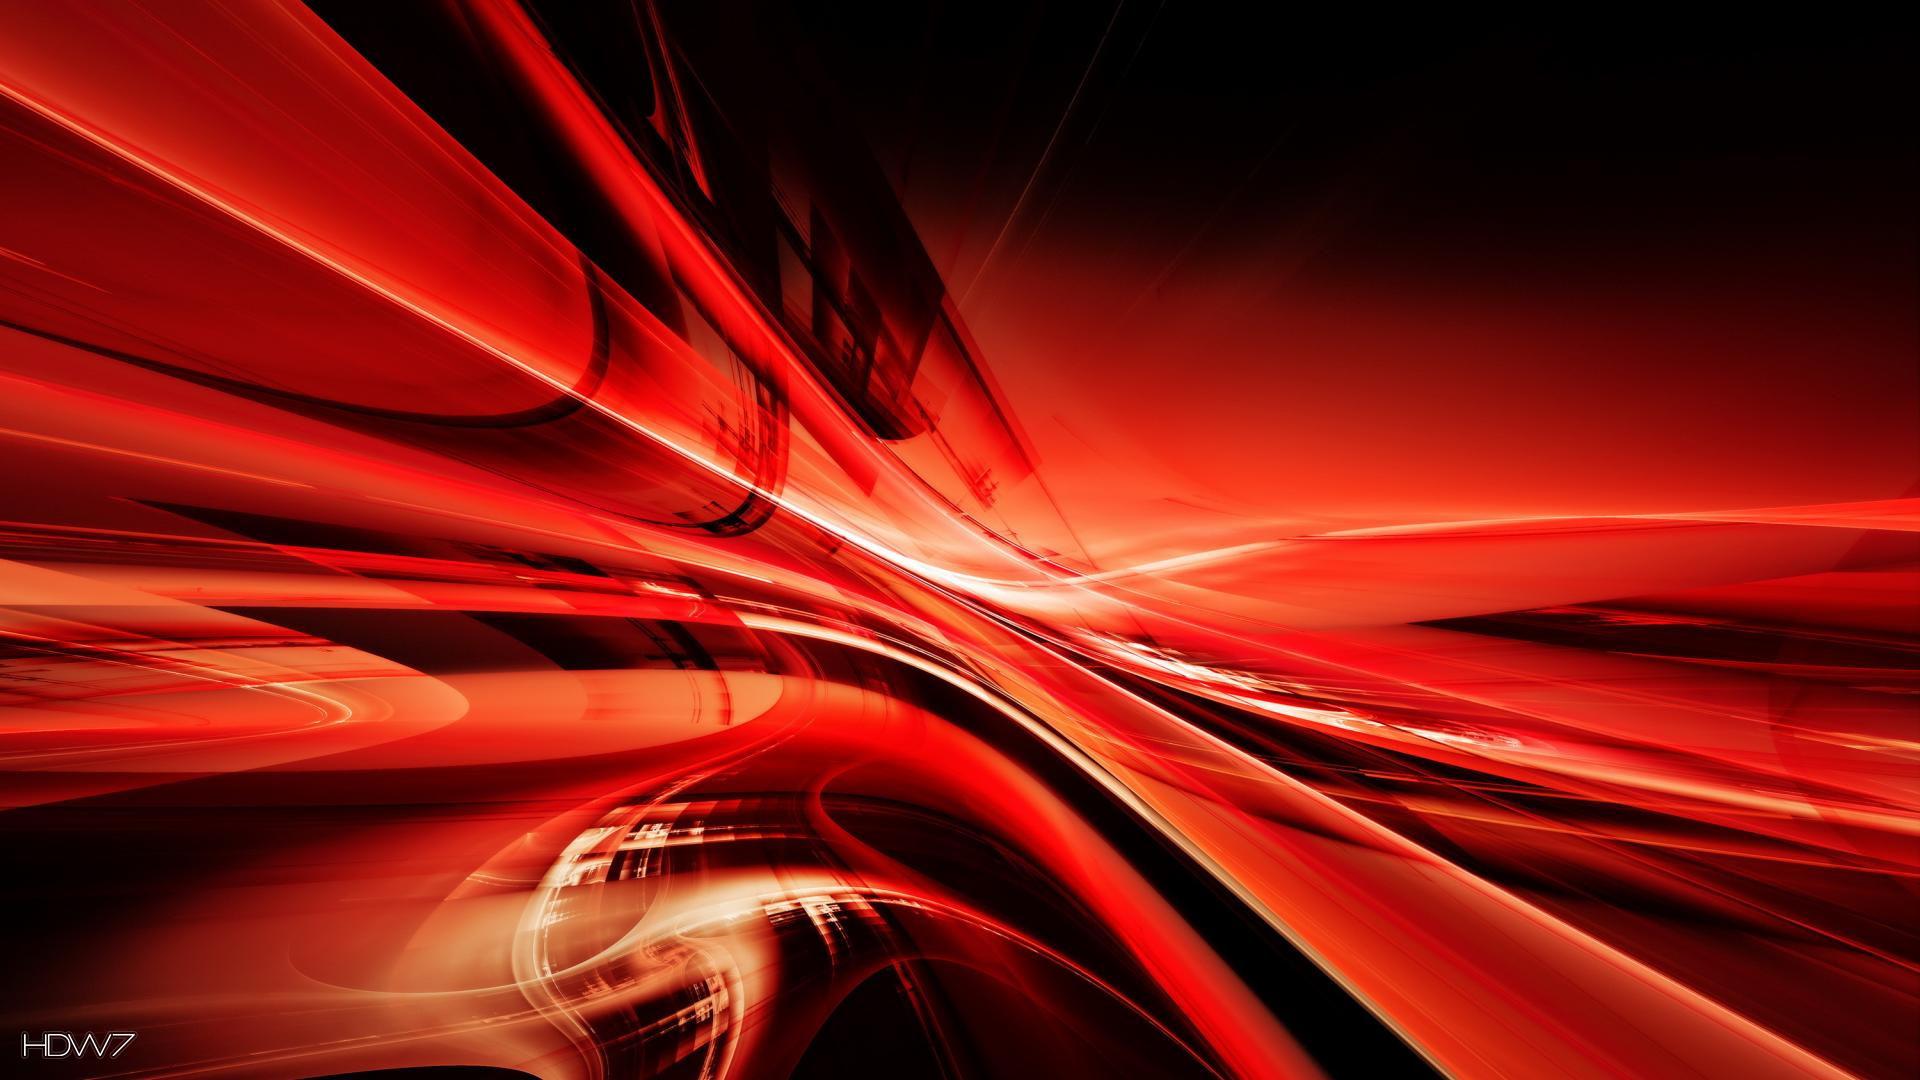 47 Red Hd Wallpapers 1080p On Wallpapersafari